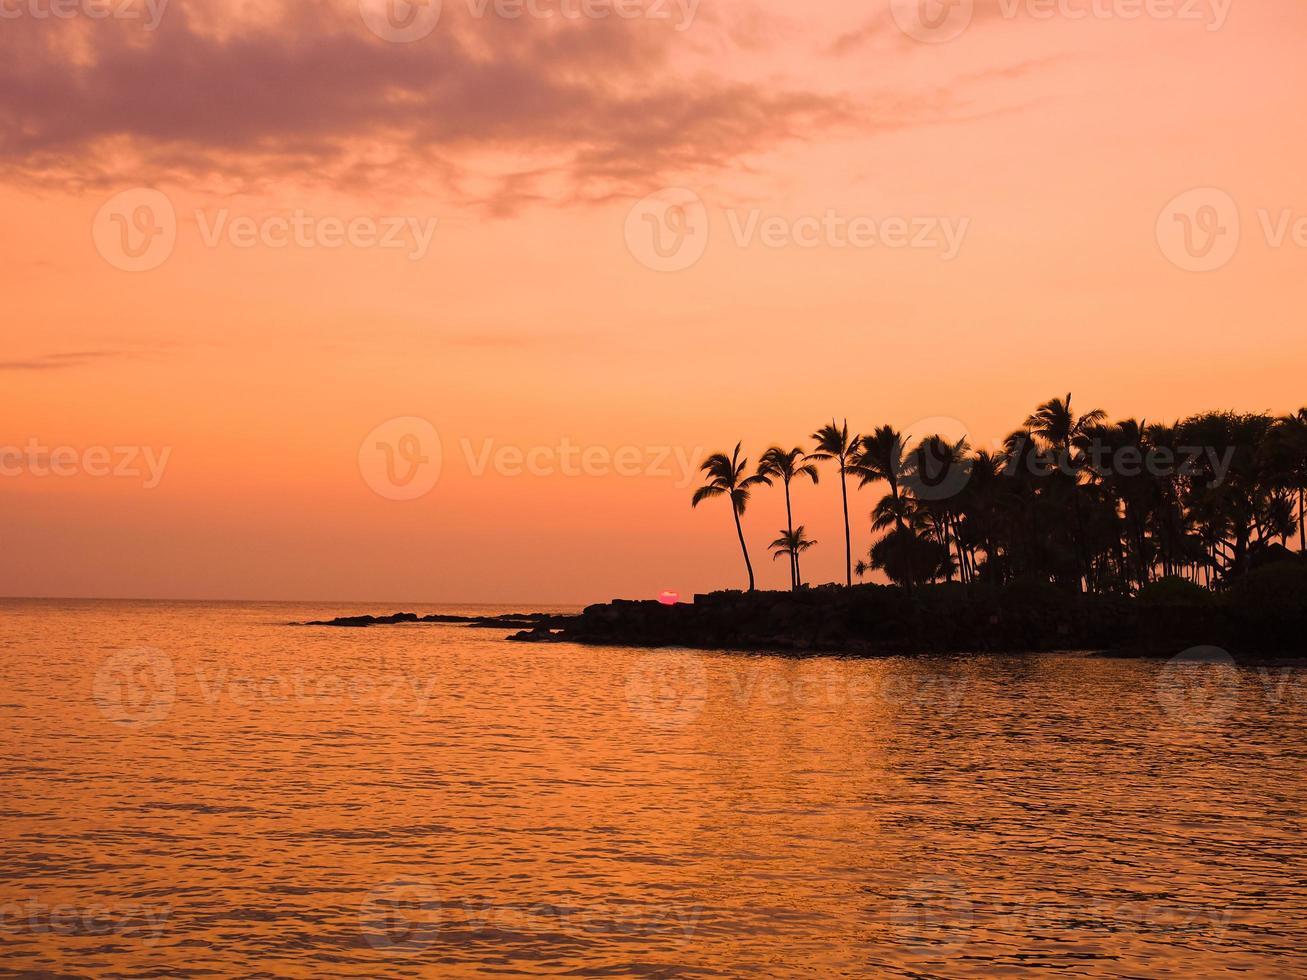 Sonnenuntergang der Hawaii-Insel foto